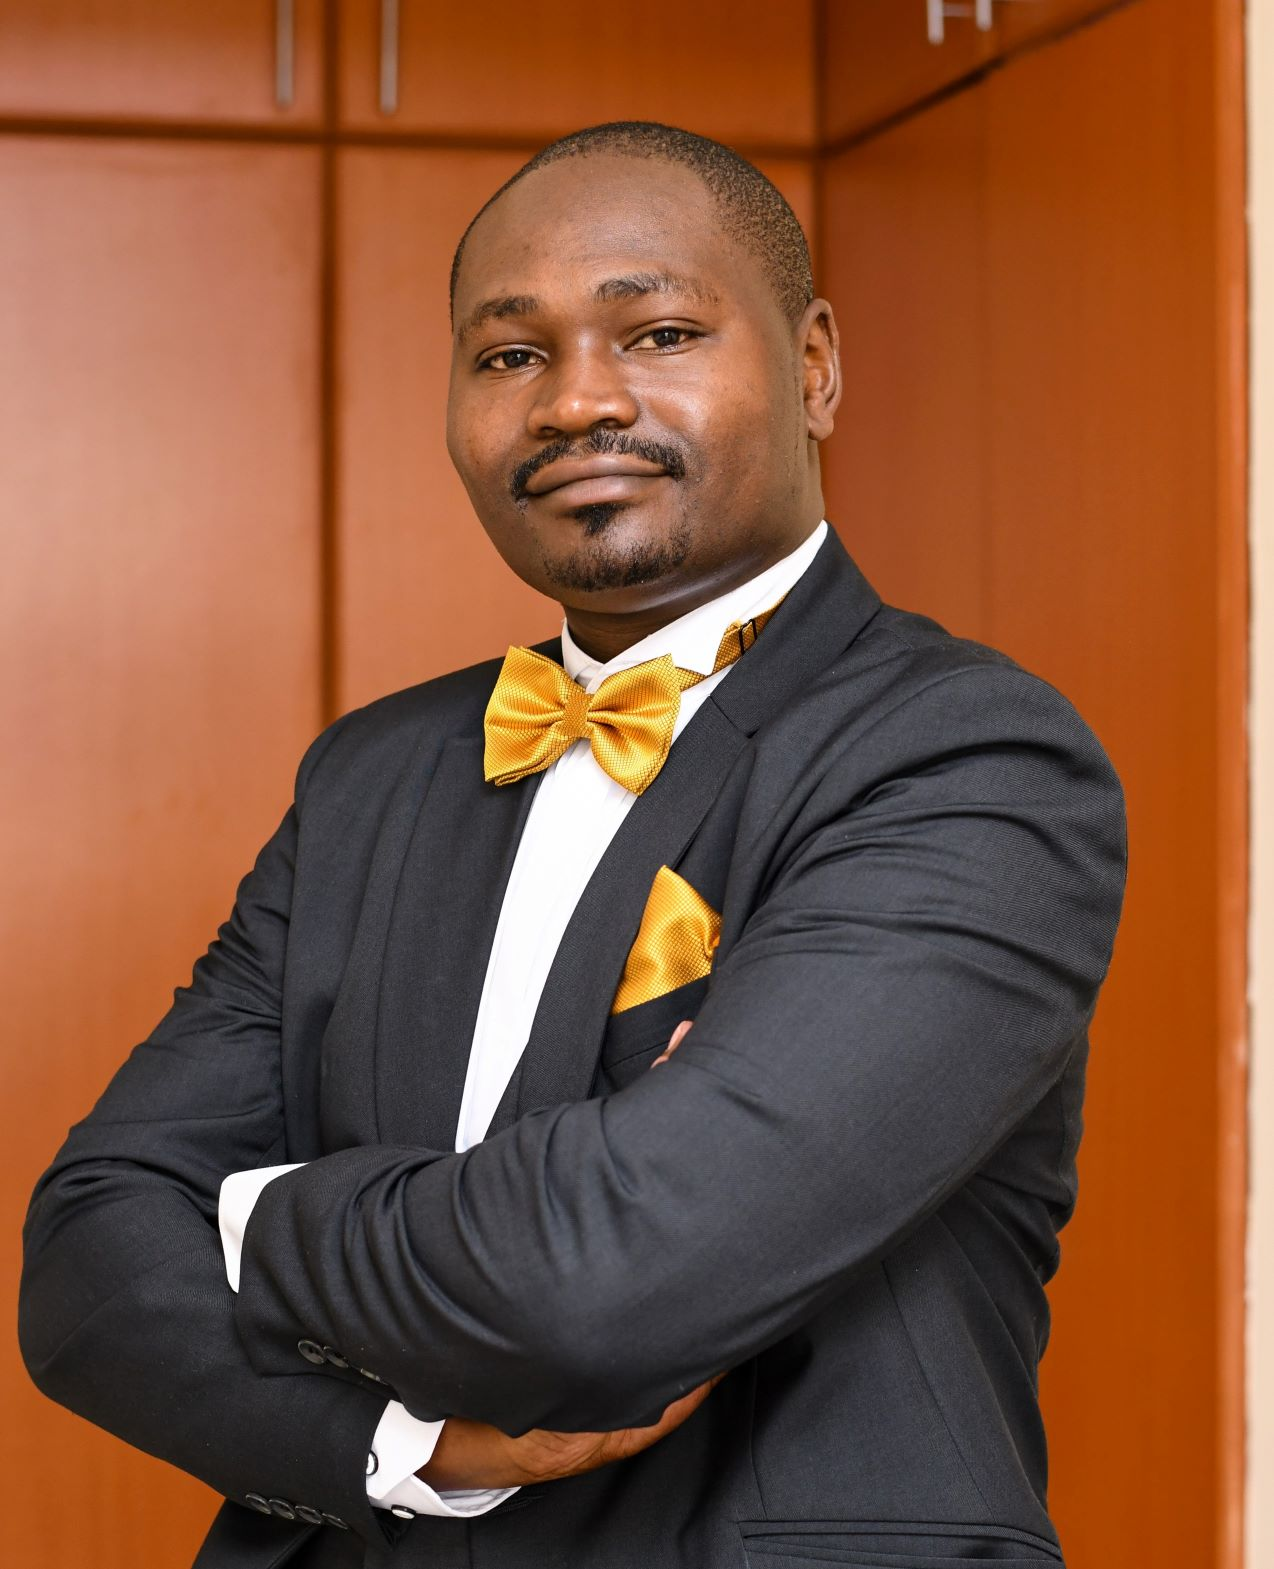 Felix Mungai Njambi